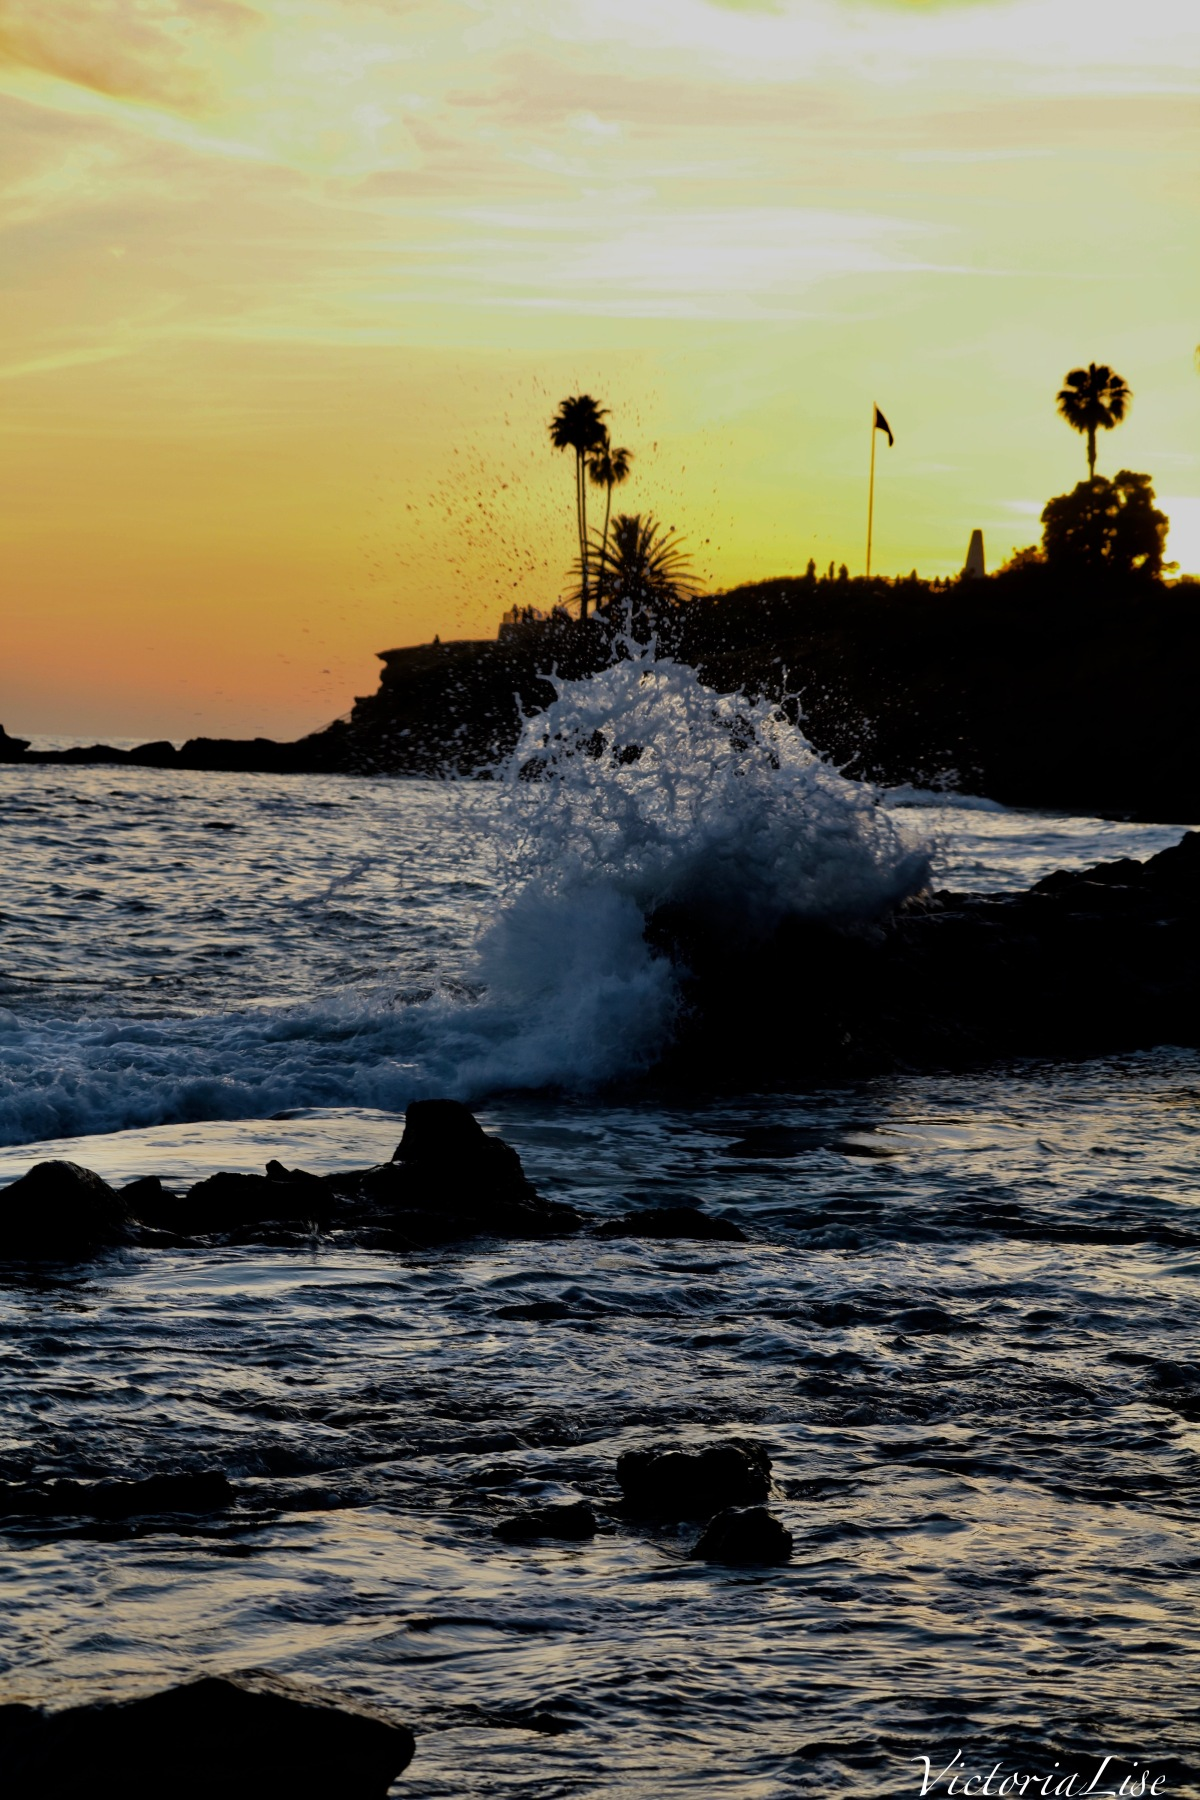 Victoria Lise Laguna Beach Sunset Wave Splashing Against Rocks